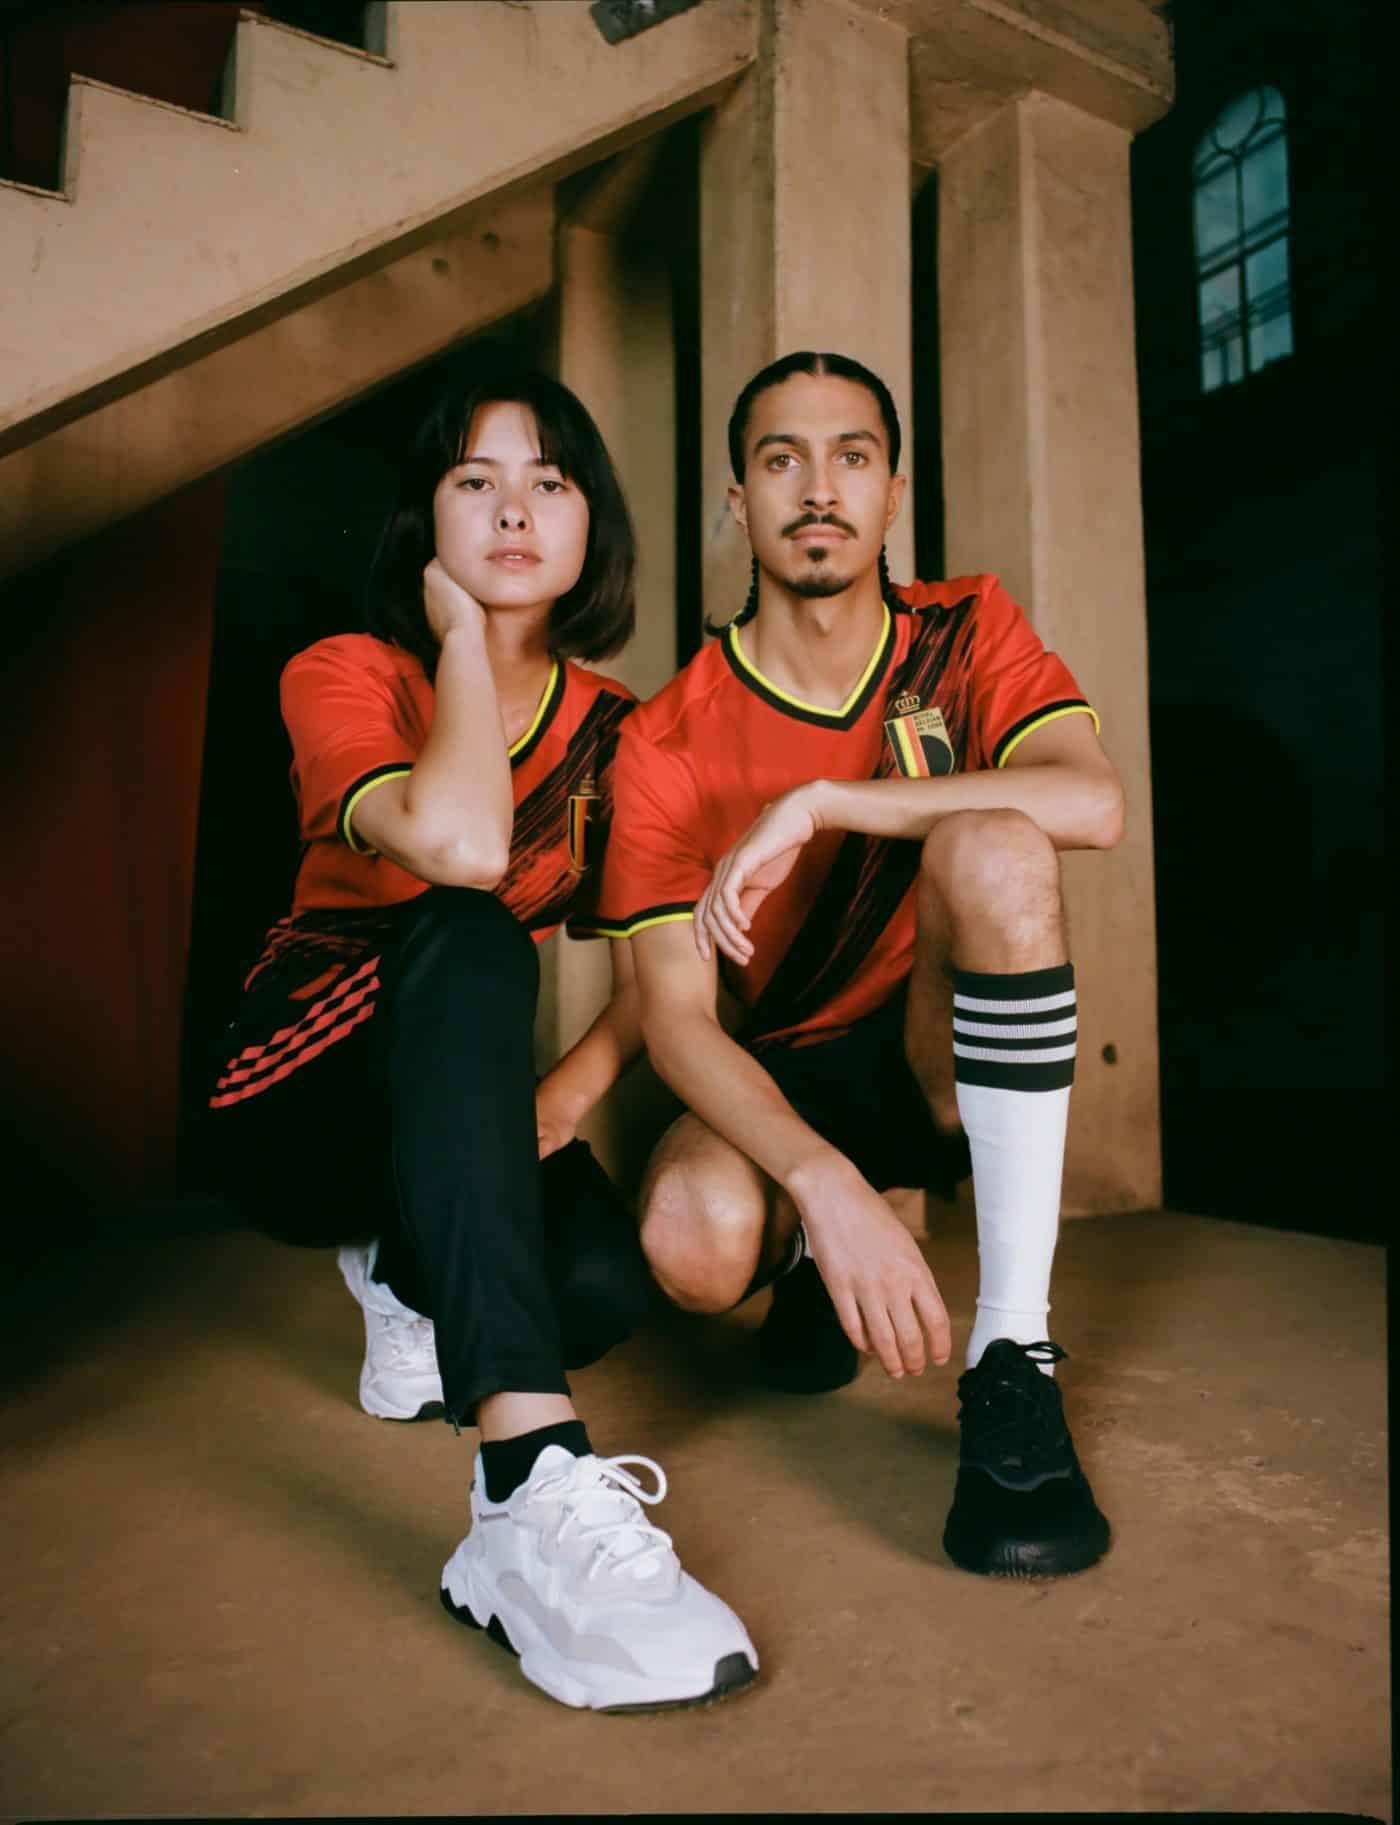 maillot-domicile-belgique-euro-2020-adidas-5